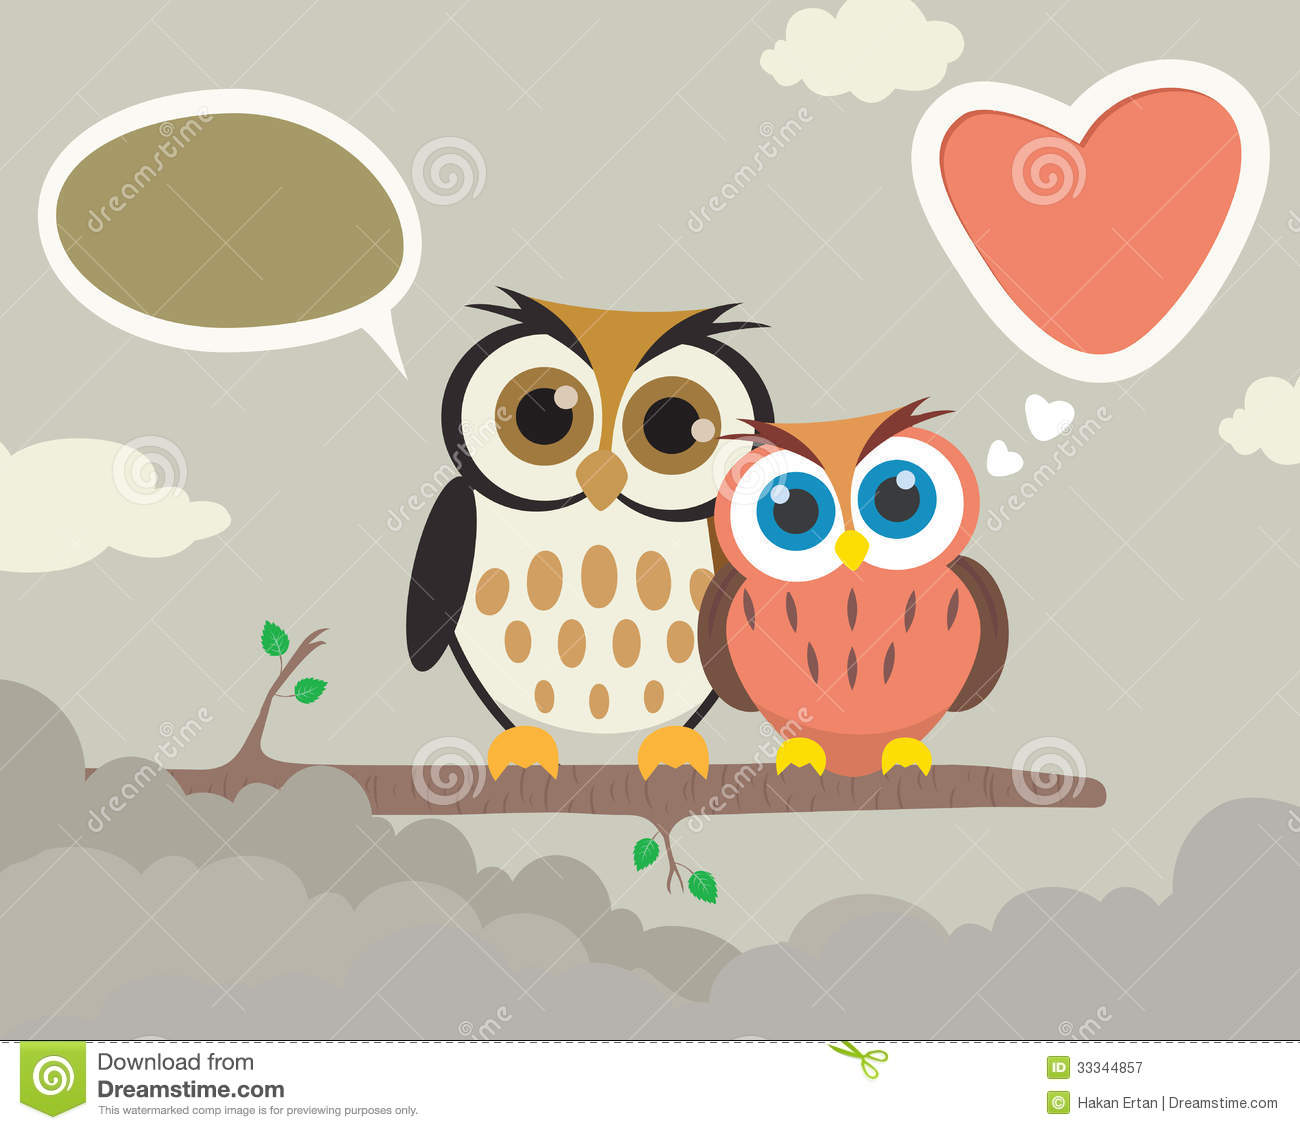 Free Owl Wallpapers: Owl Cartoon Wallpaper